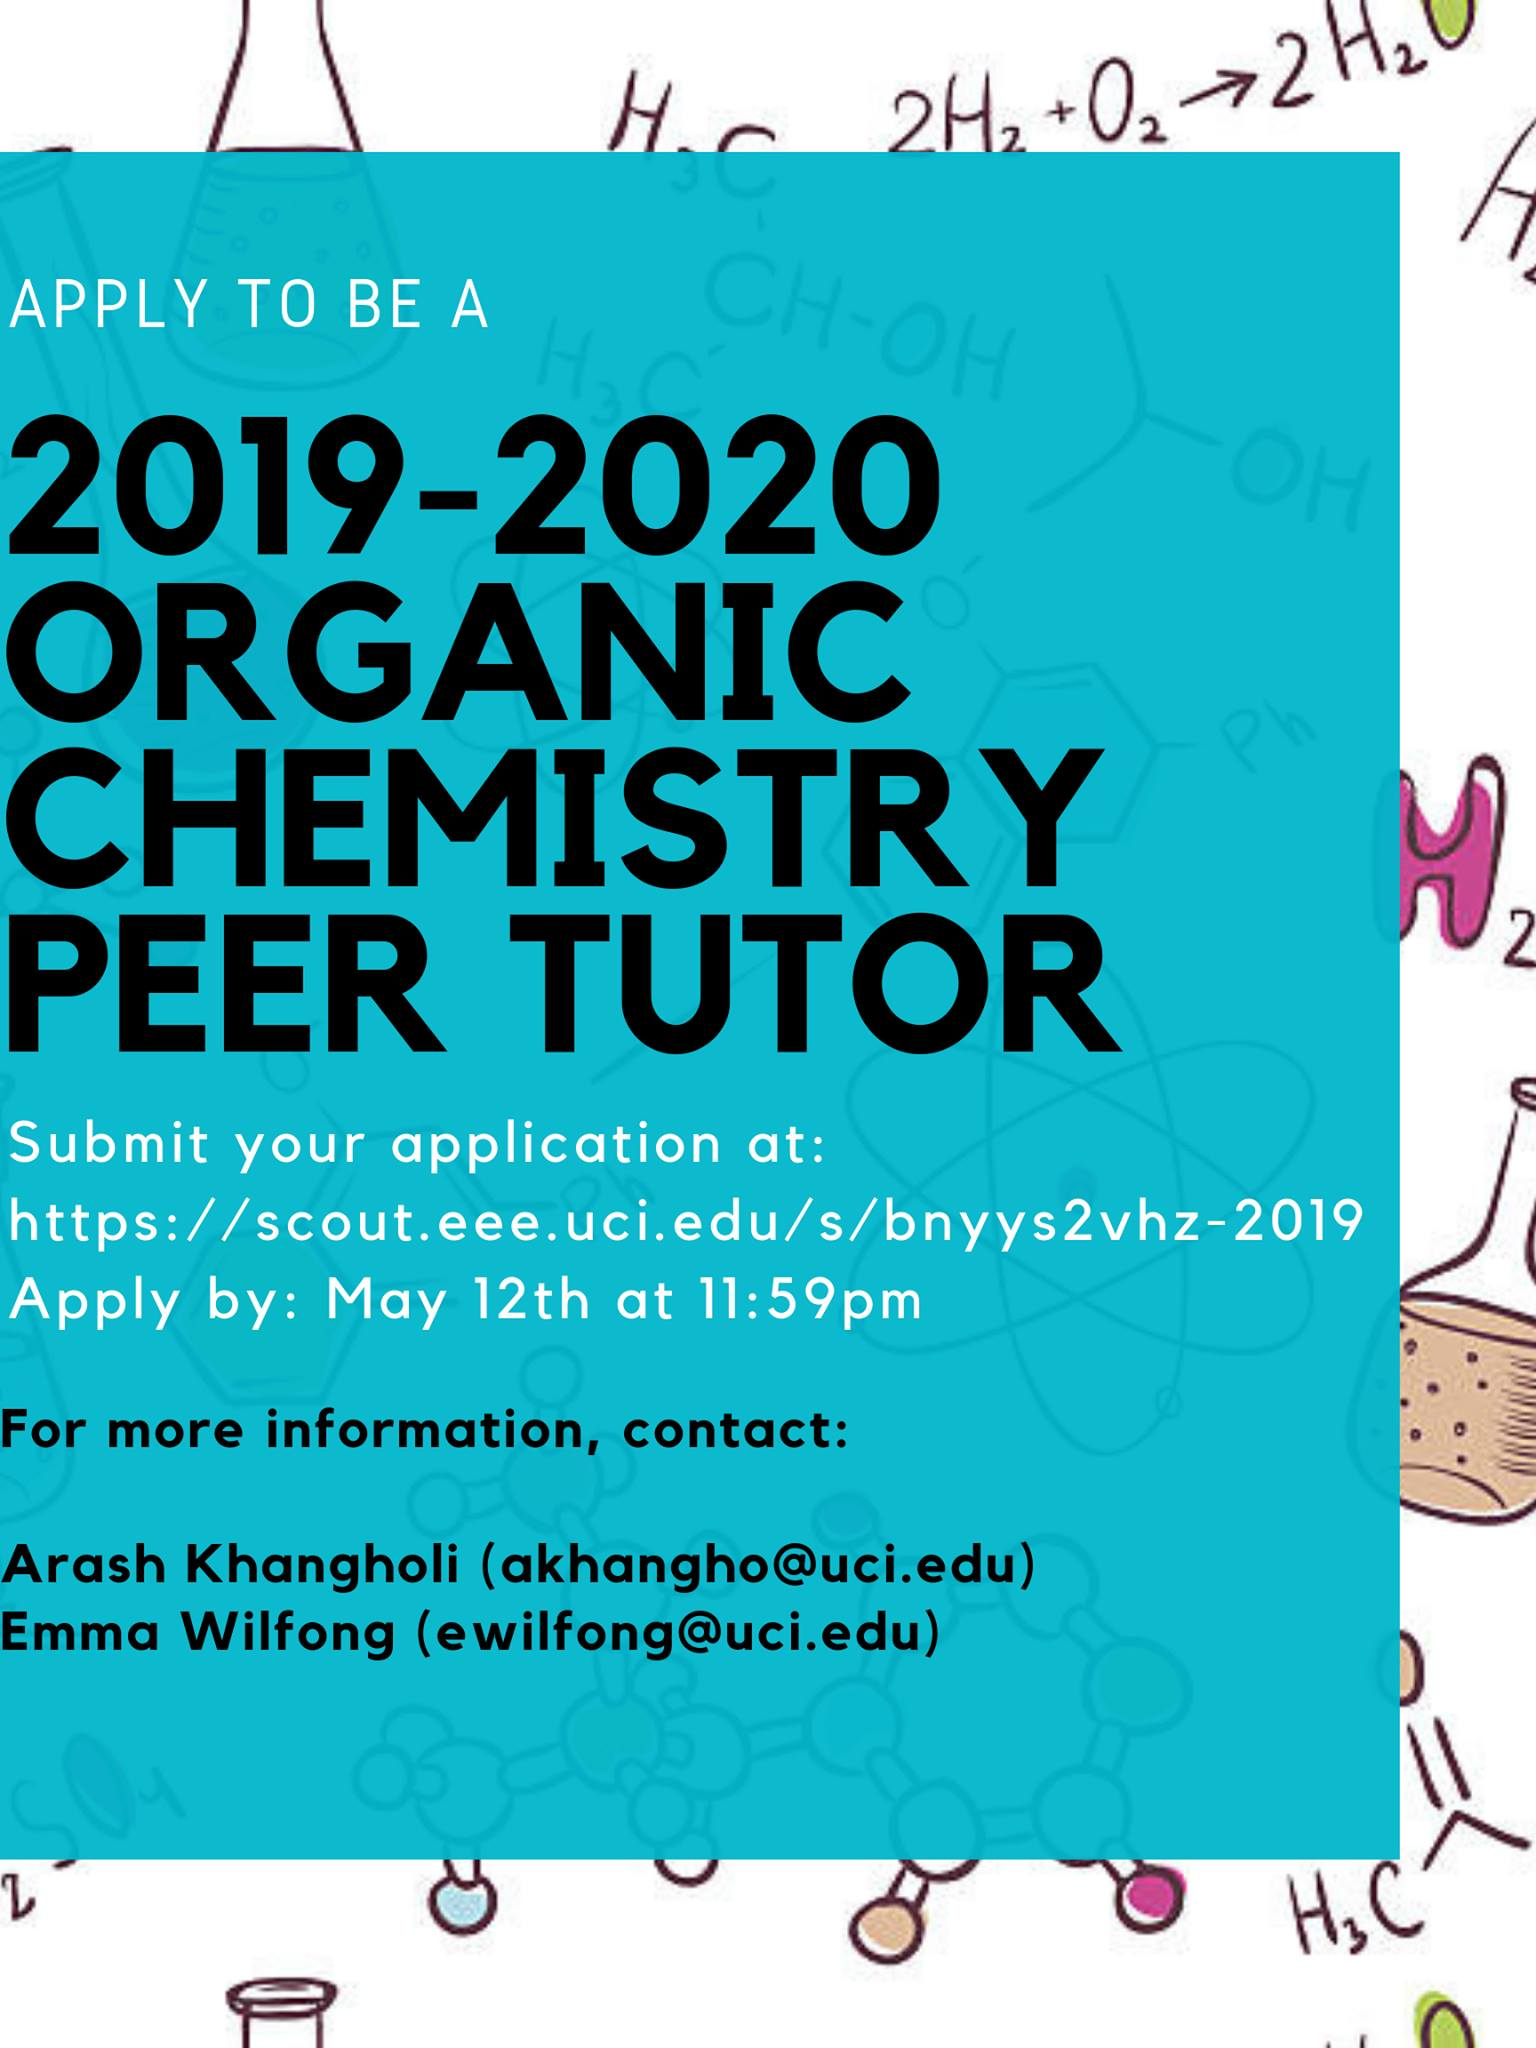 UCI ORGANIC CHEMISTRY PEER TUTORING – Free tutoring for Organic